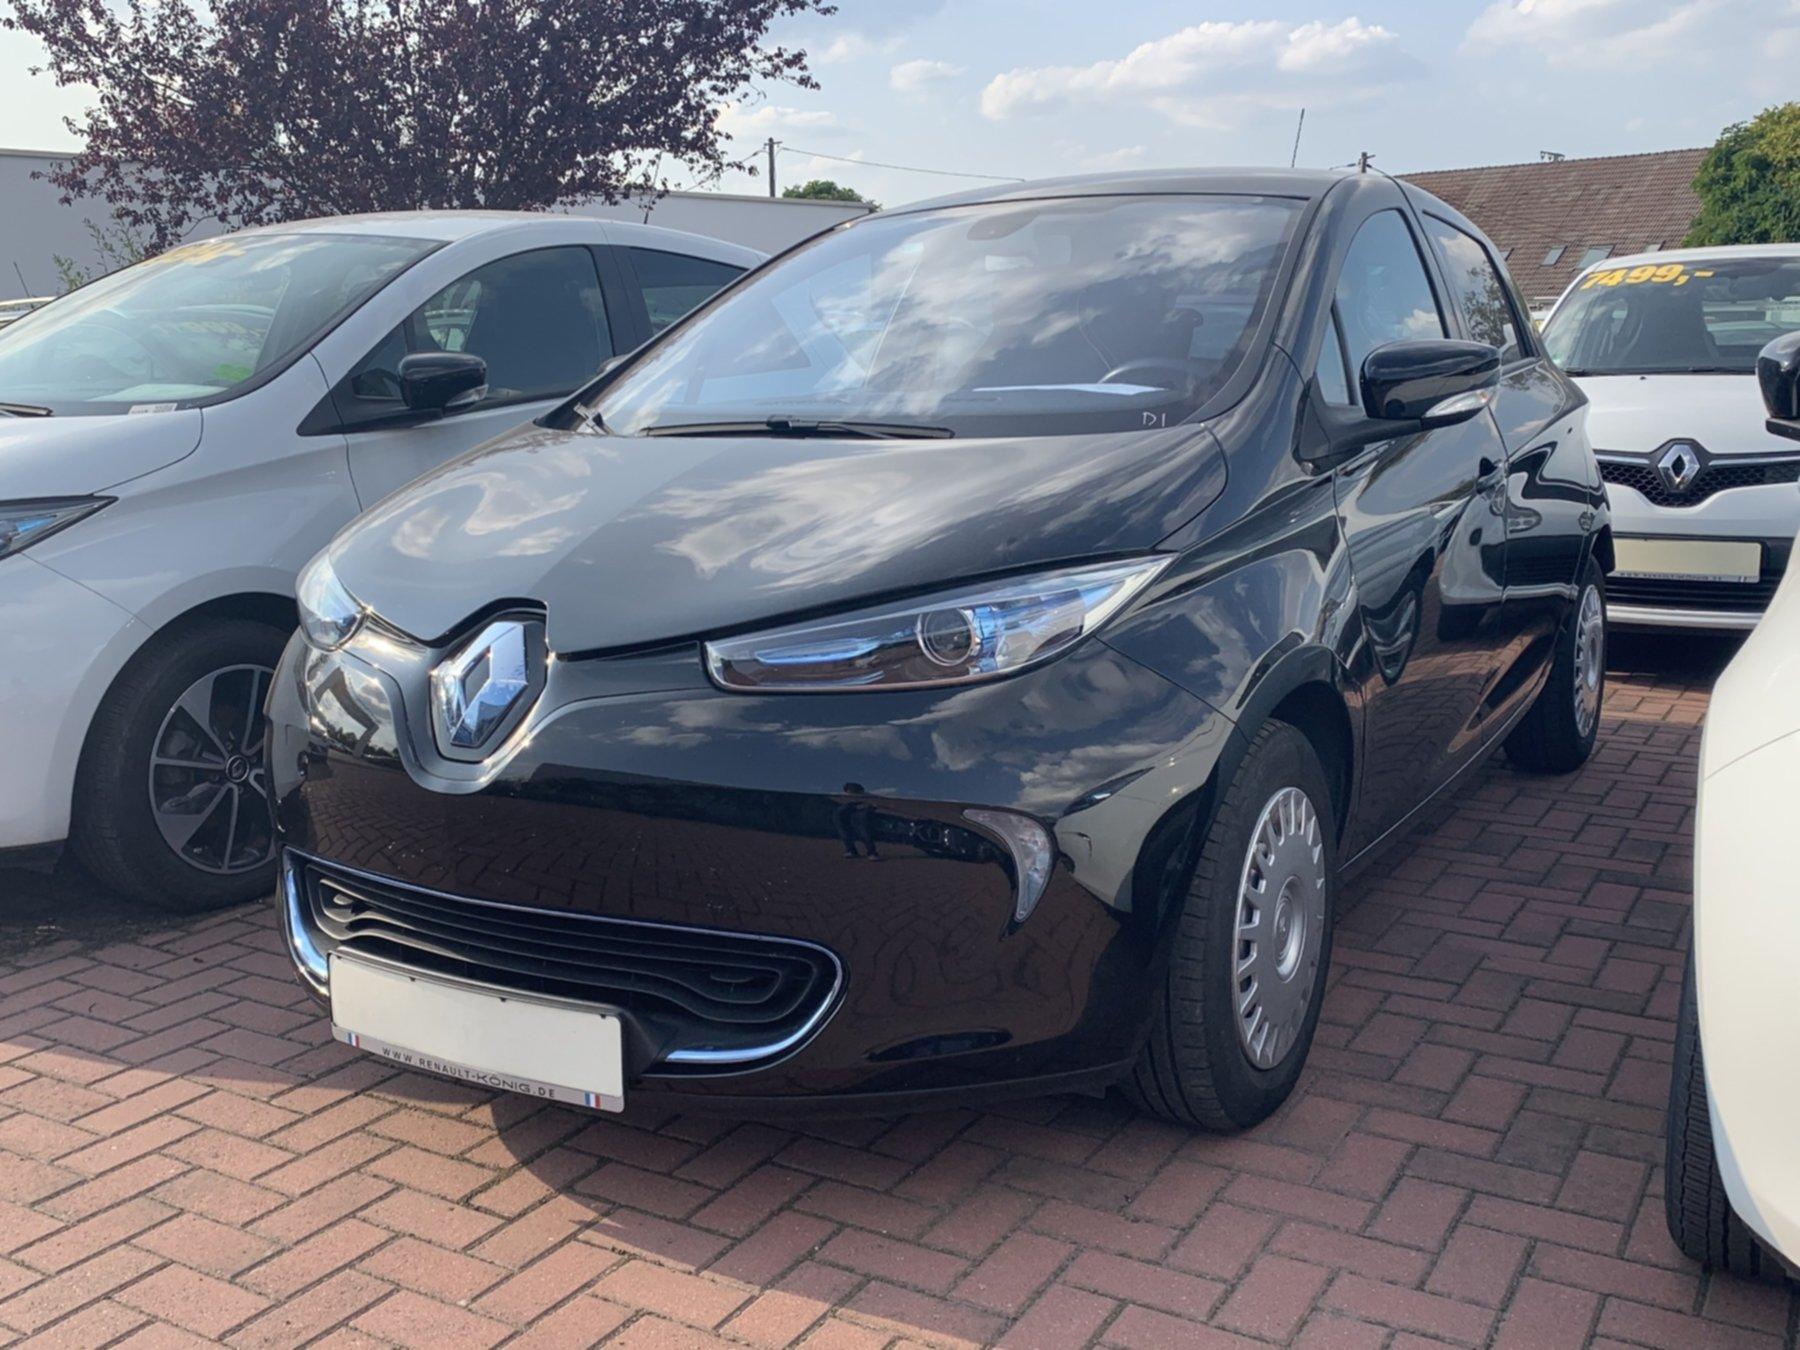 Renault ZOE INTENS 22 kWh Navigationssystem, Jahr 2014, Elektro